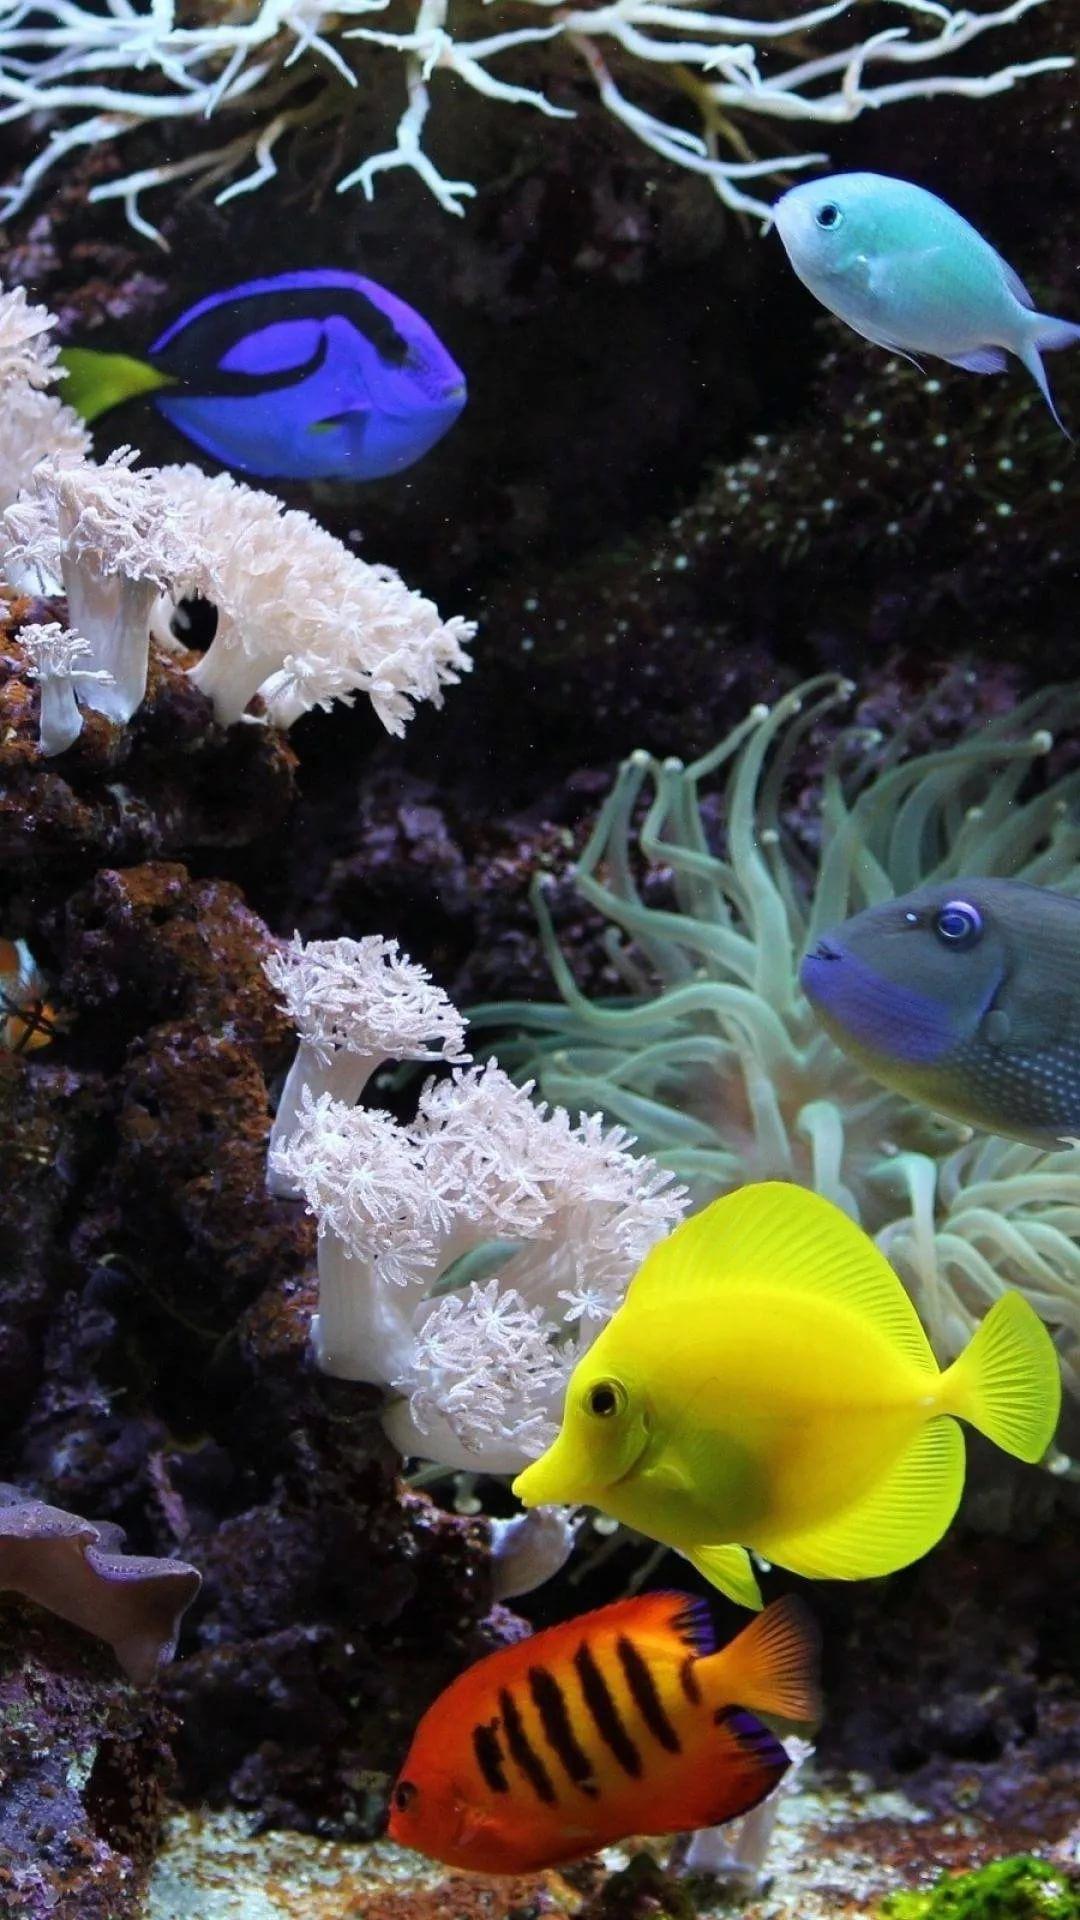 Free Tropical Fish Galaxy s9 wallpaper